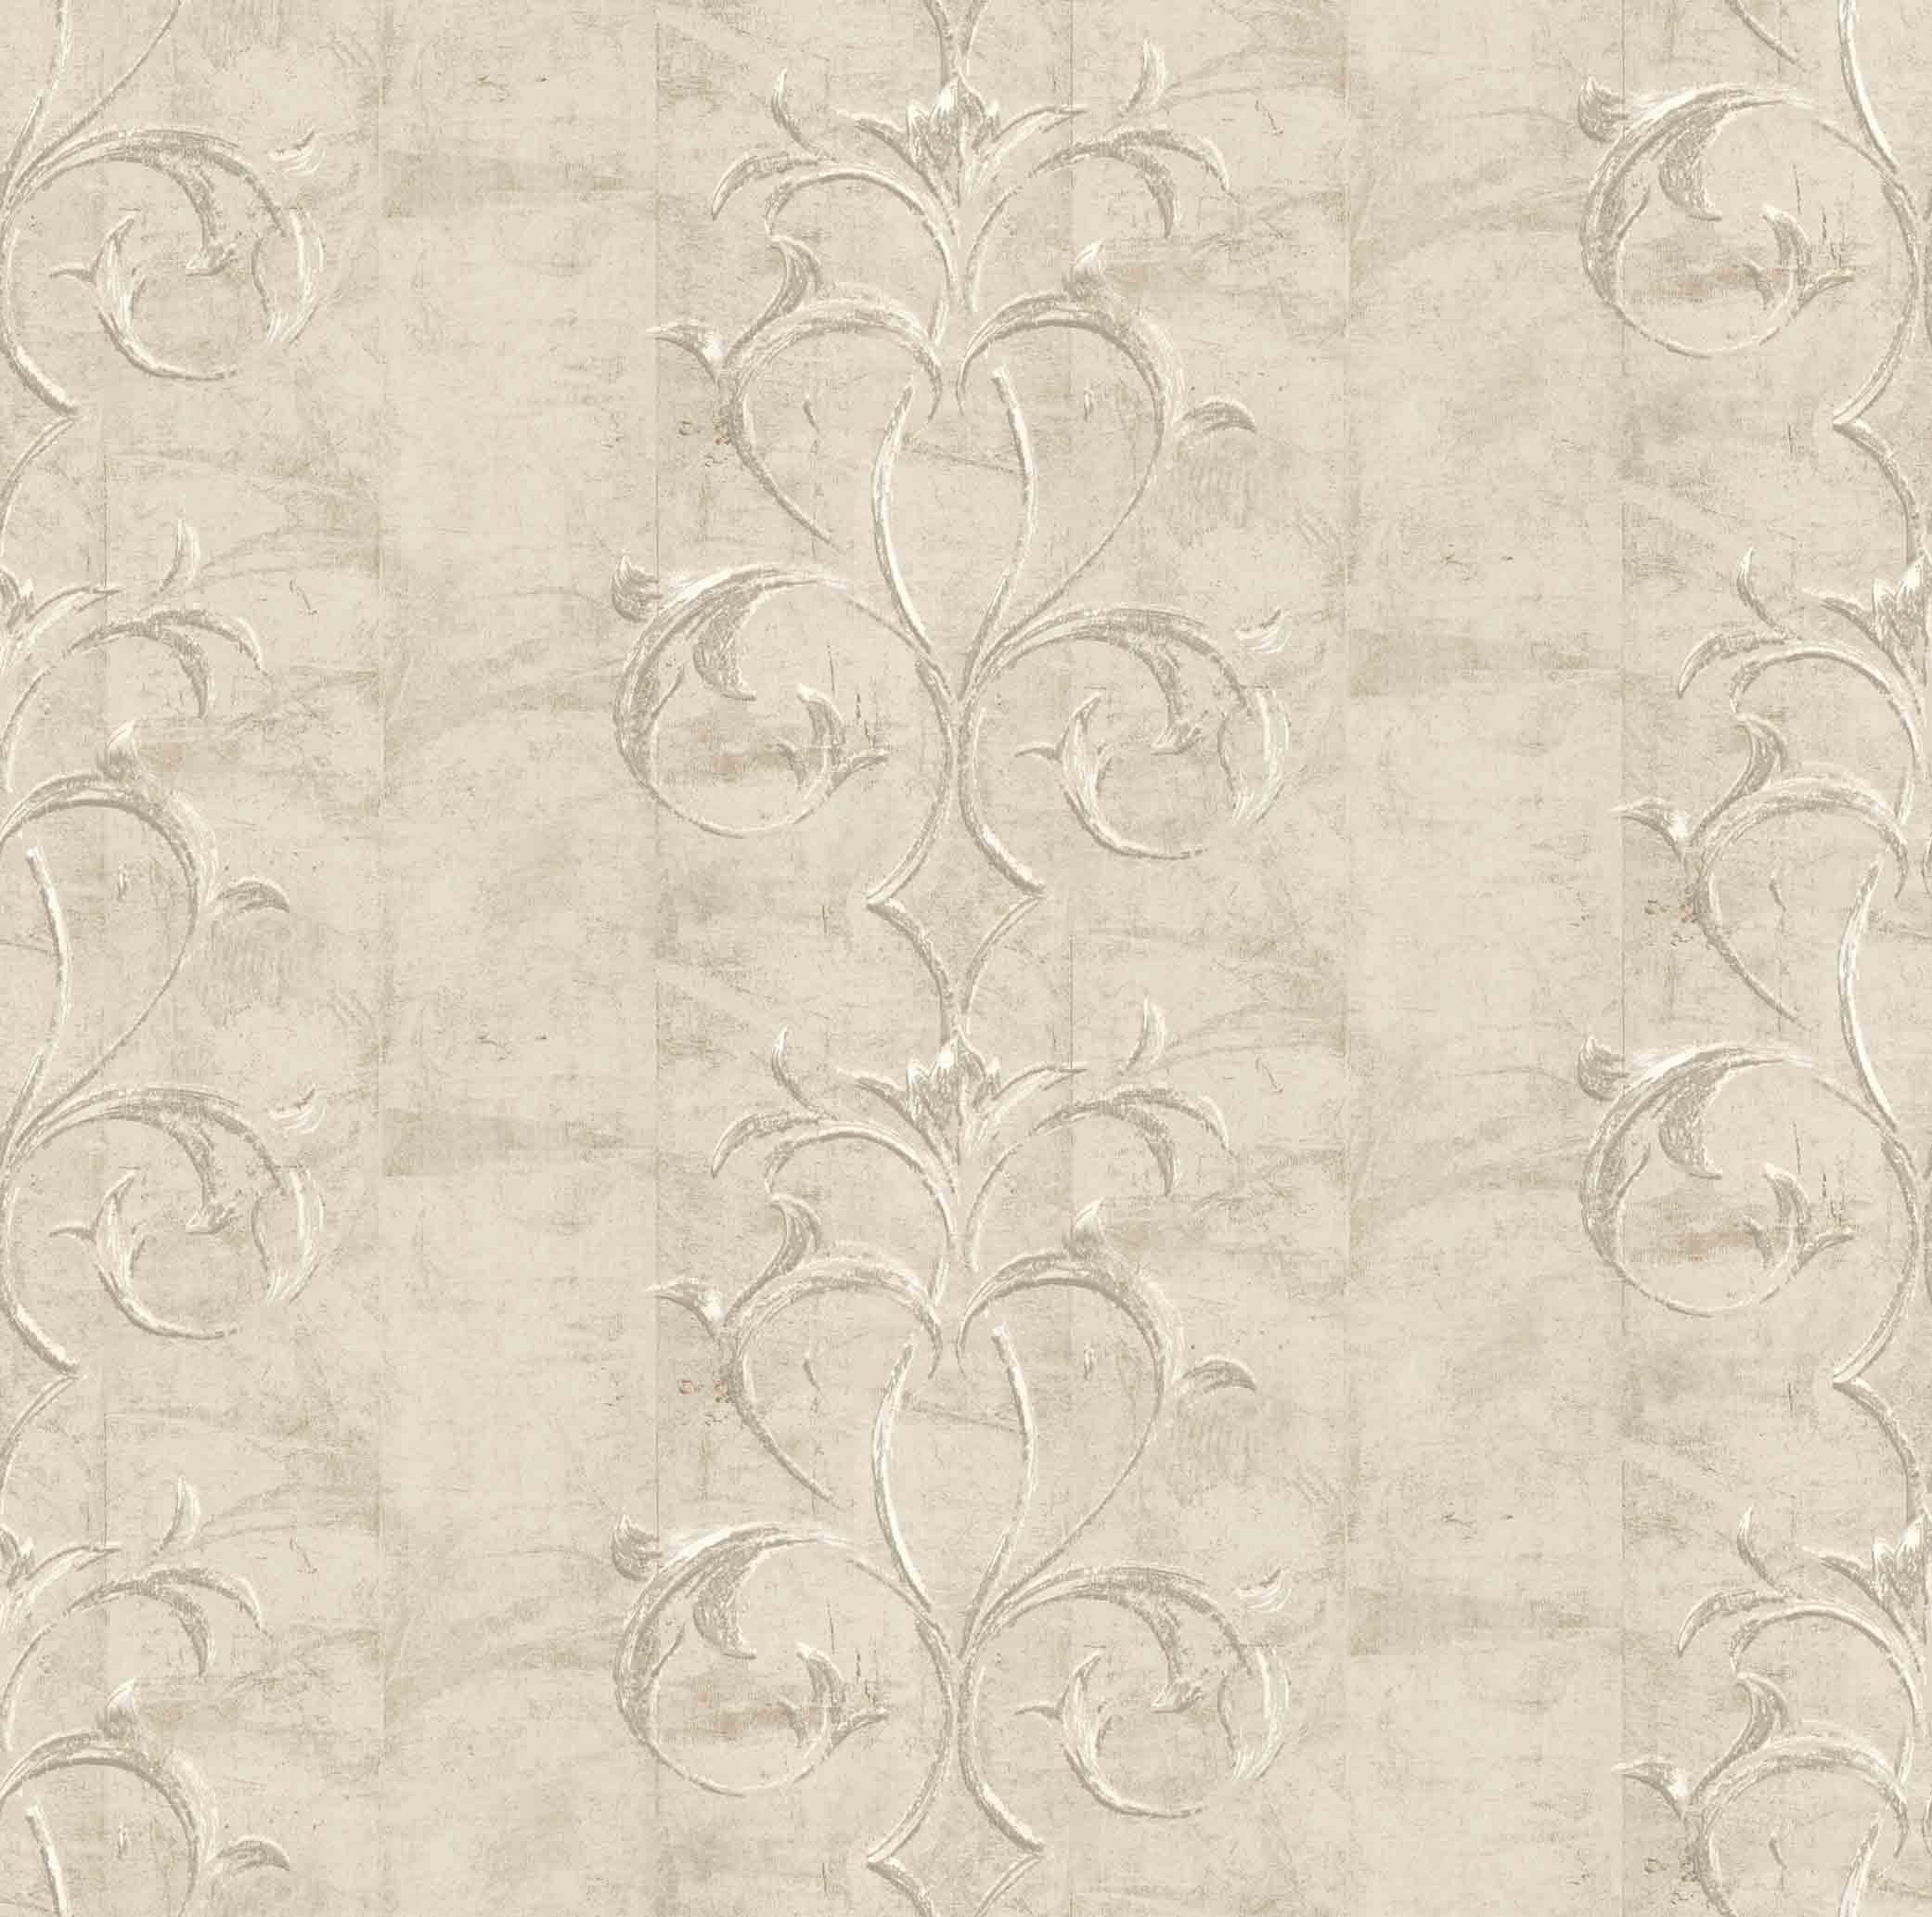 کاغذ دیواری مدیسون GD21807